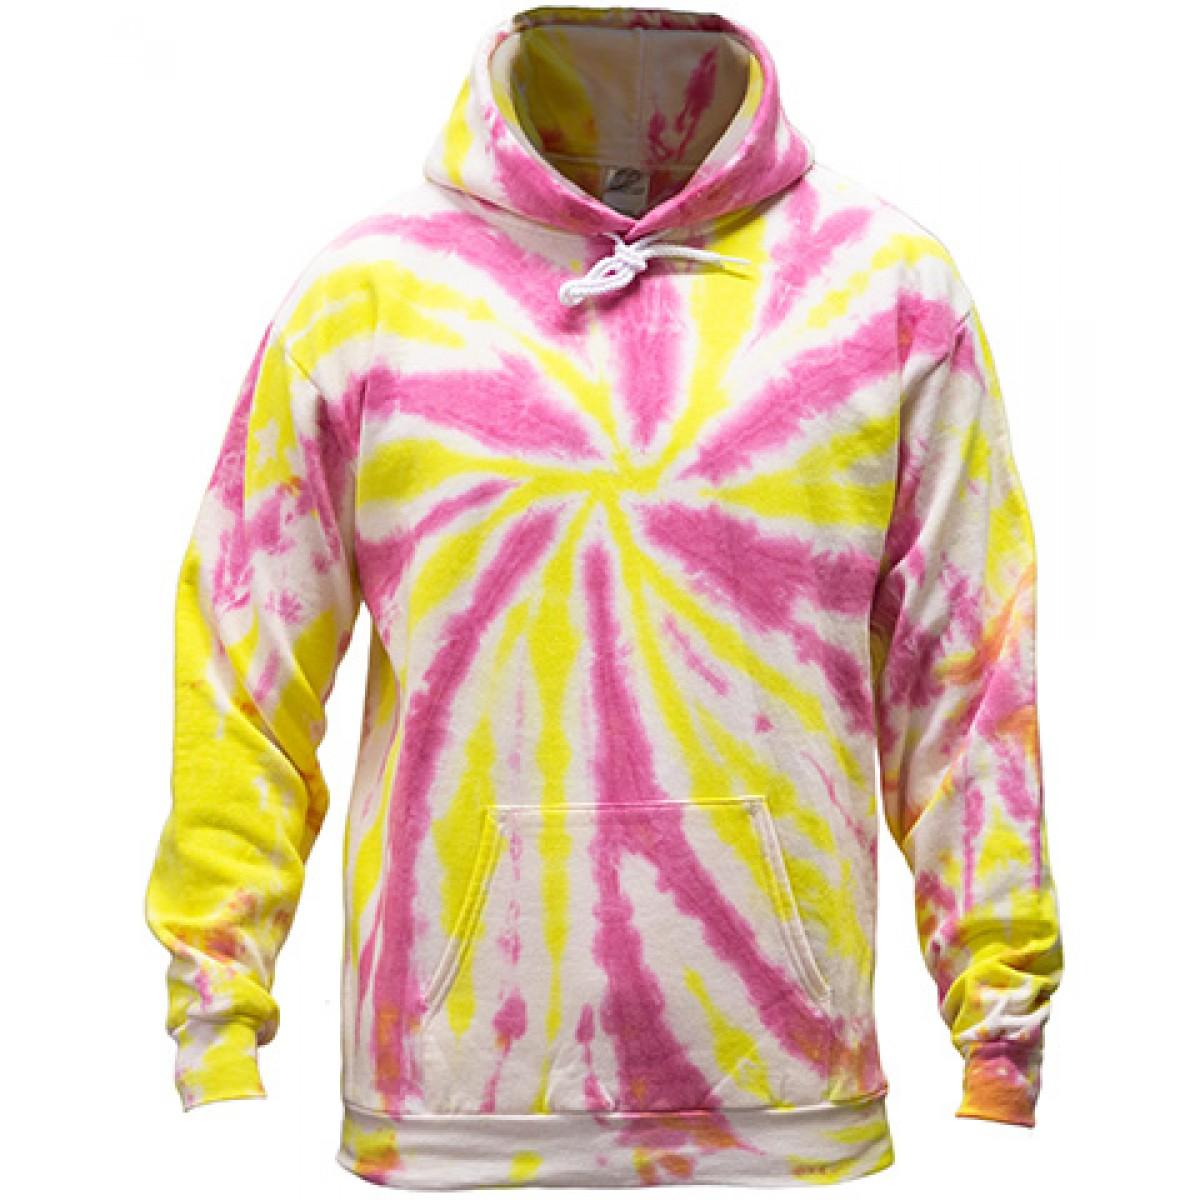 Tie-Dye Pullover Hooded Sweatshirt-Pink/Yellow-YM